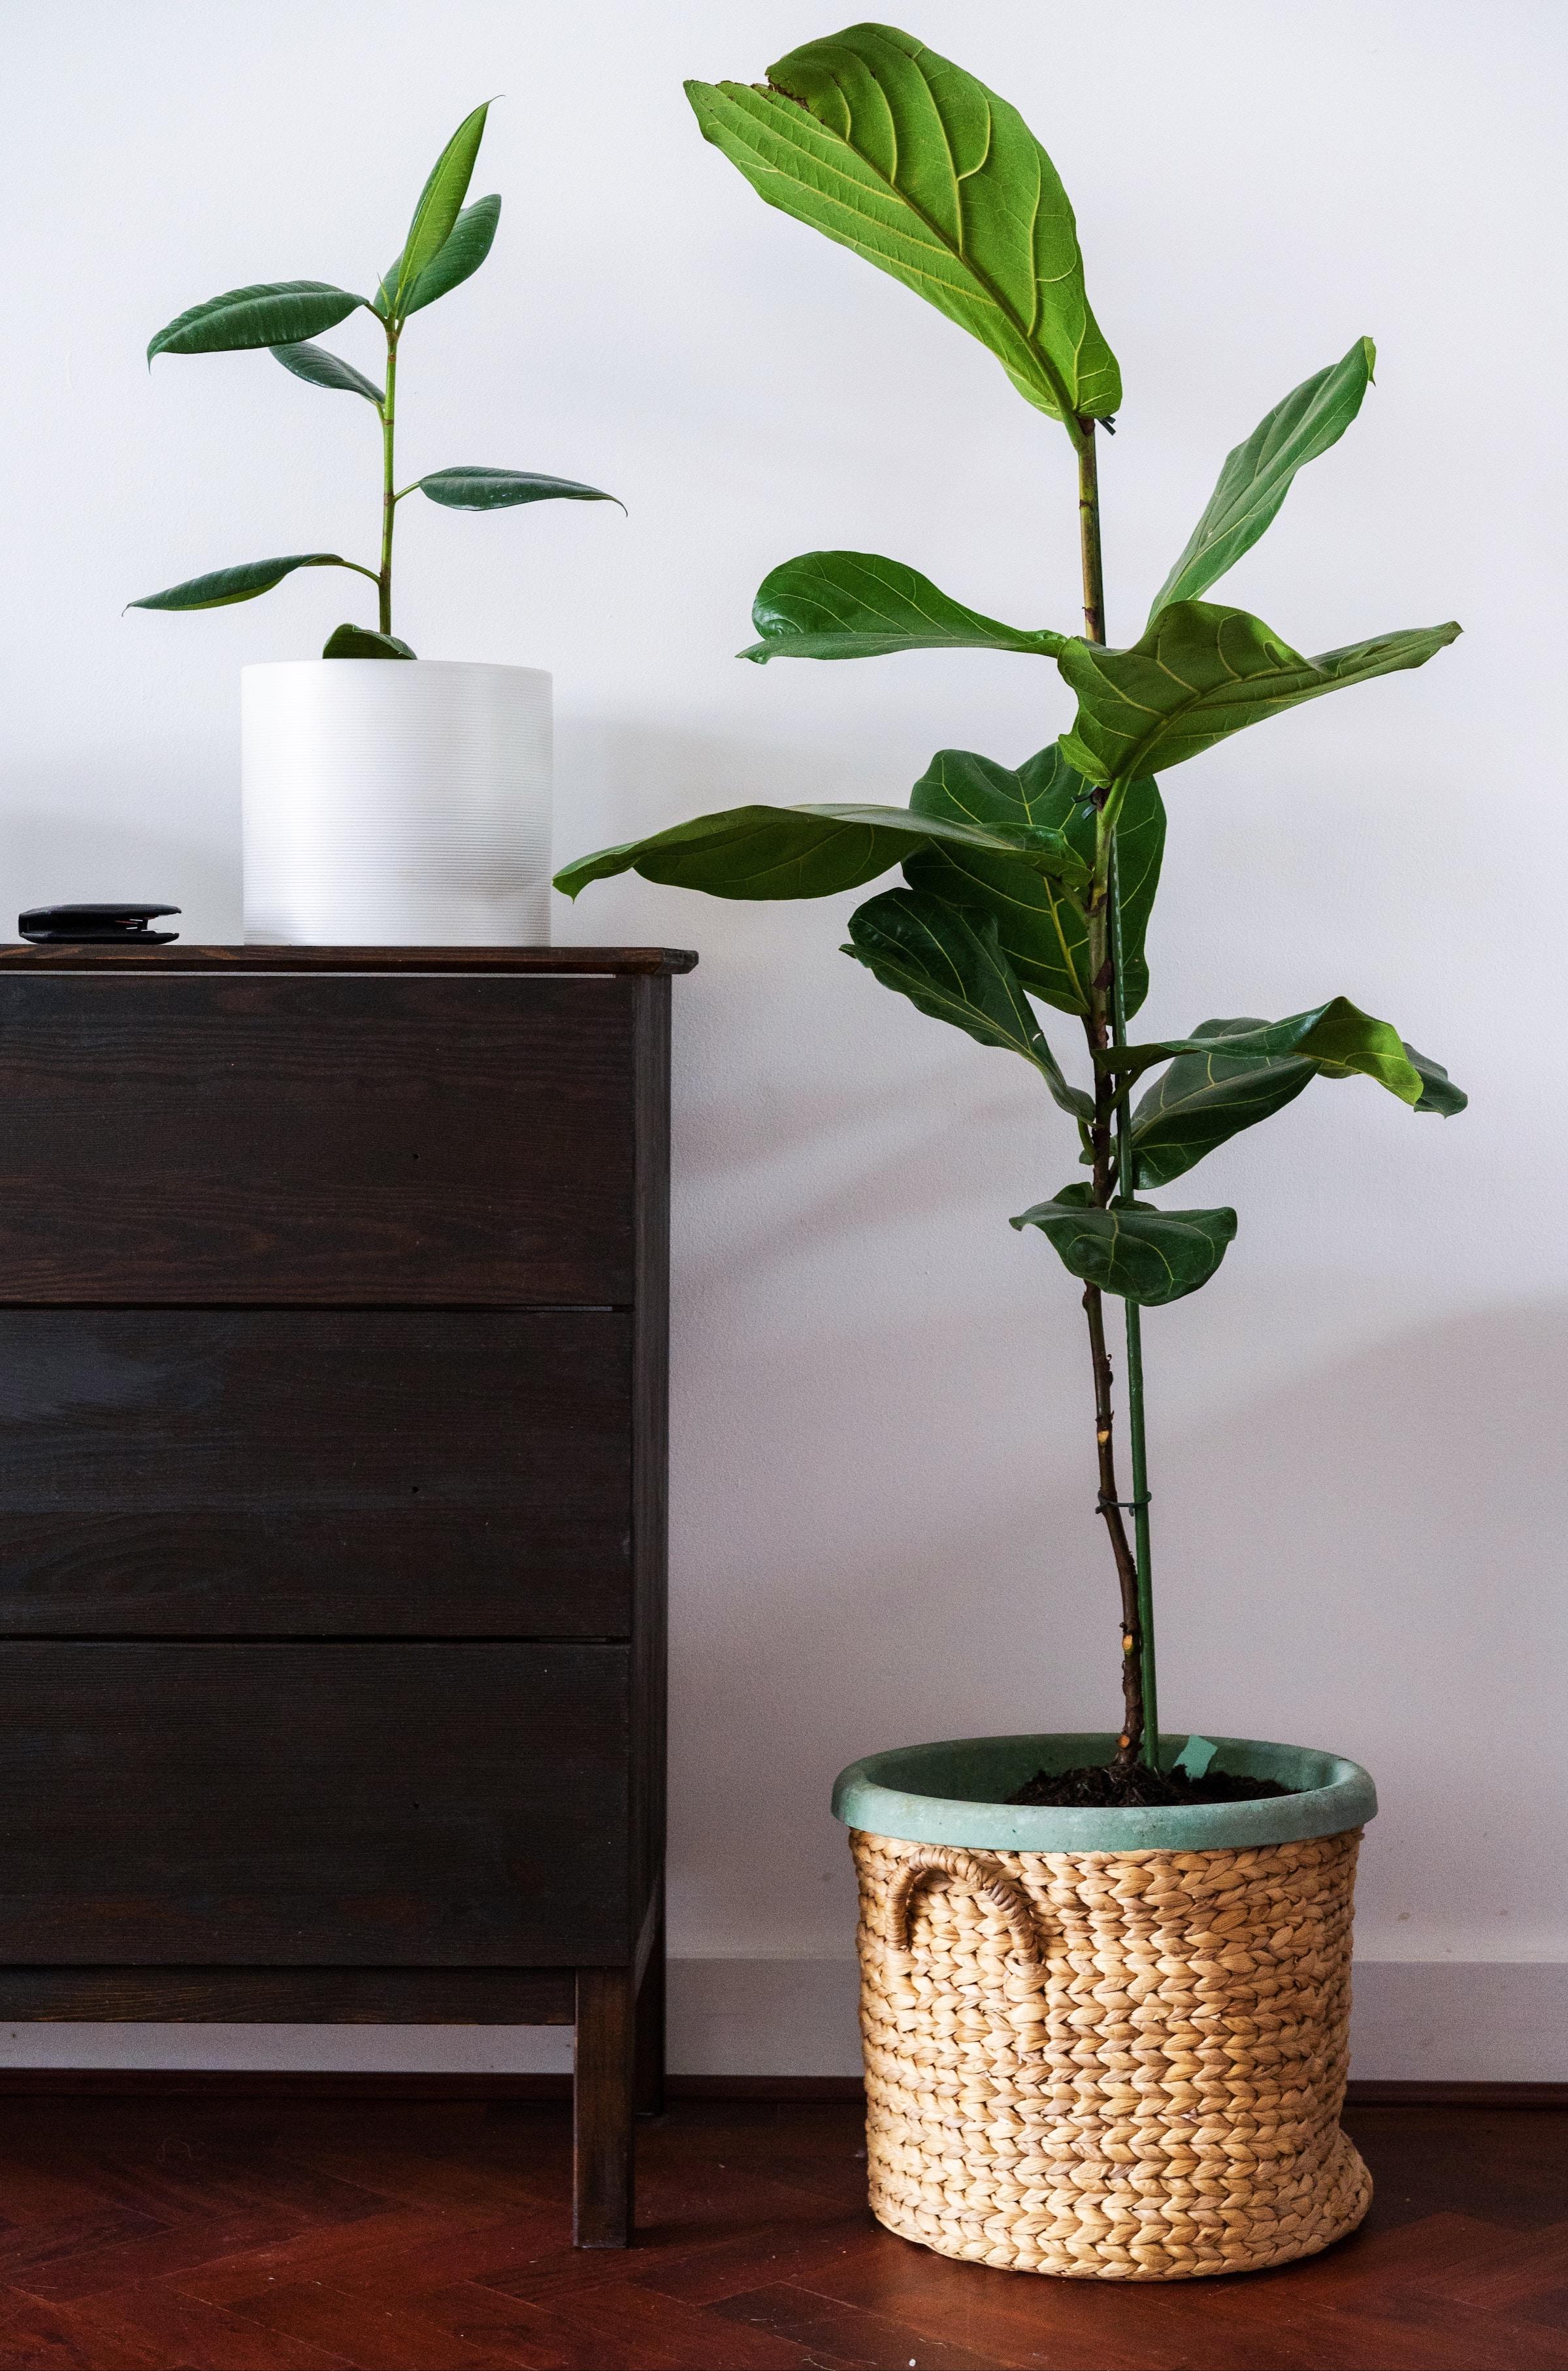 House Plants - Rumman Amin